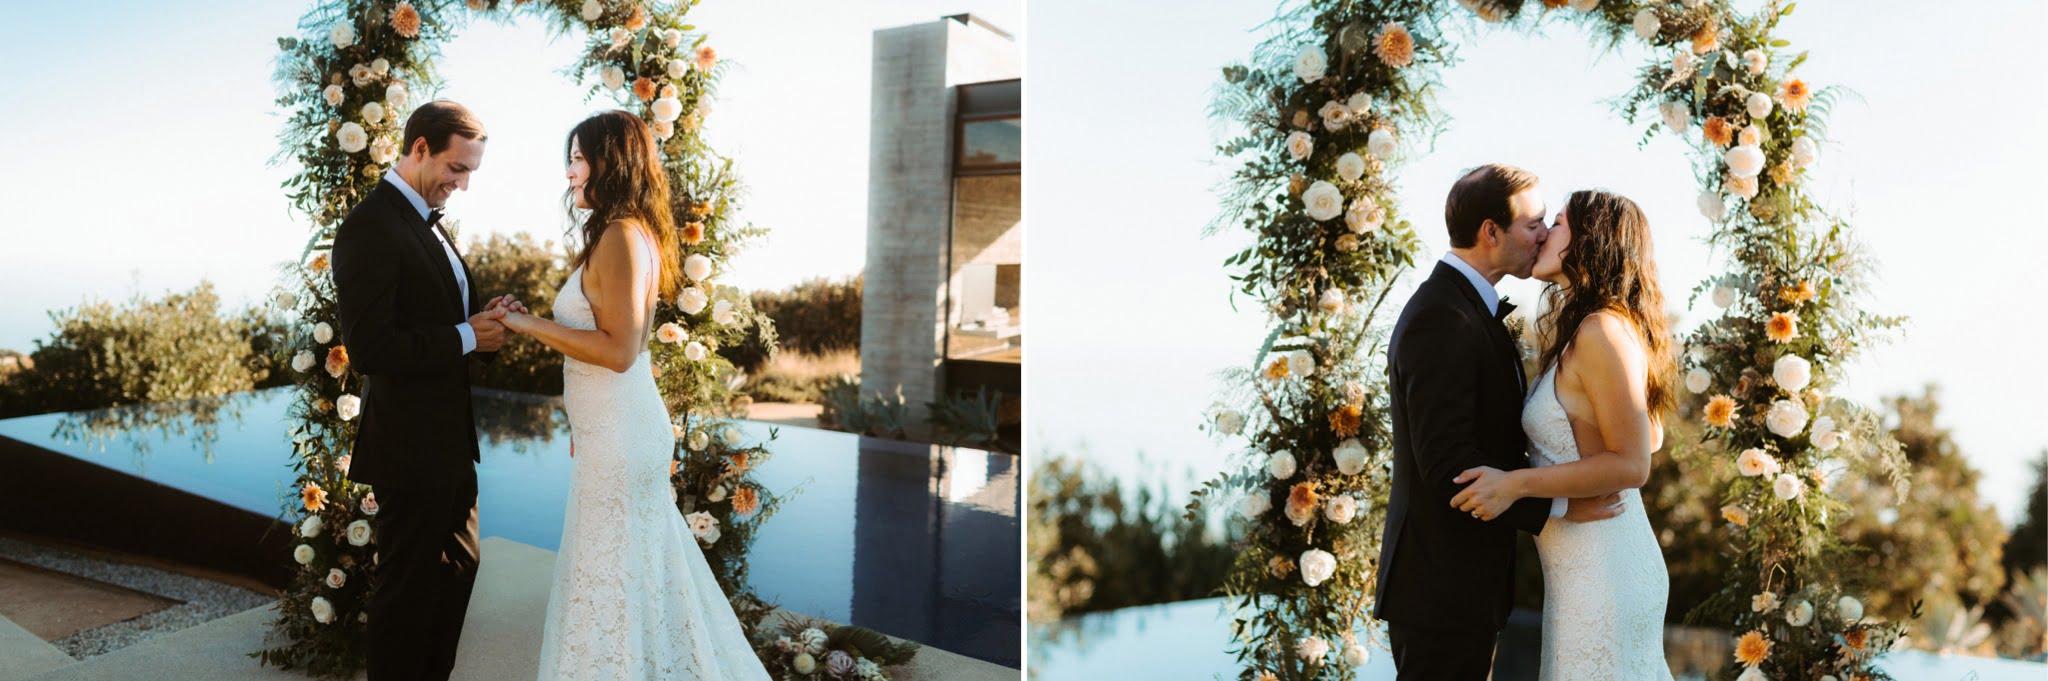 malibu wedding 064 1